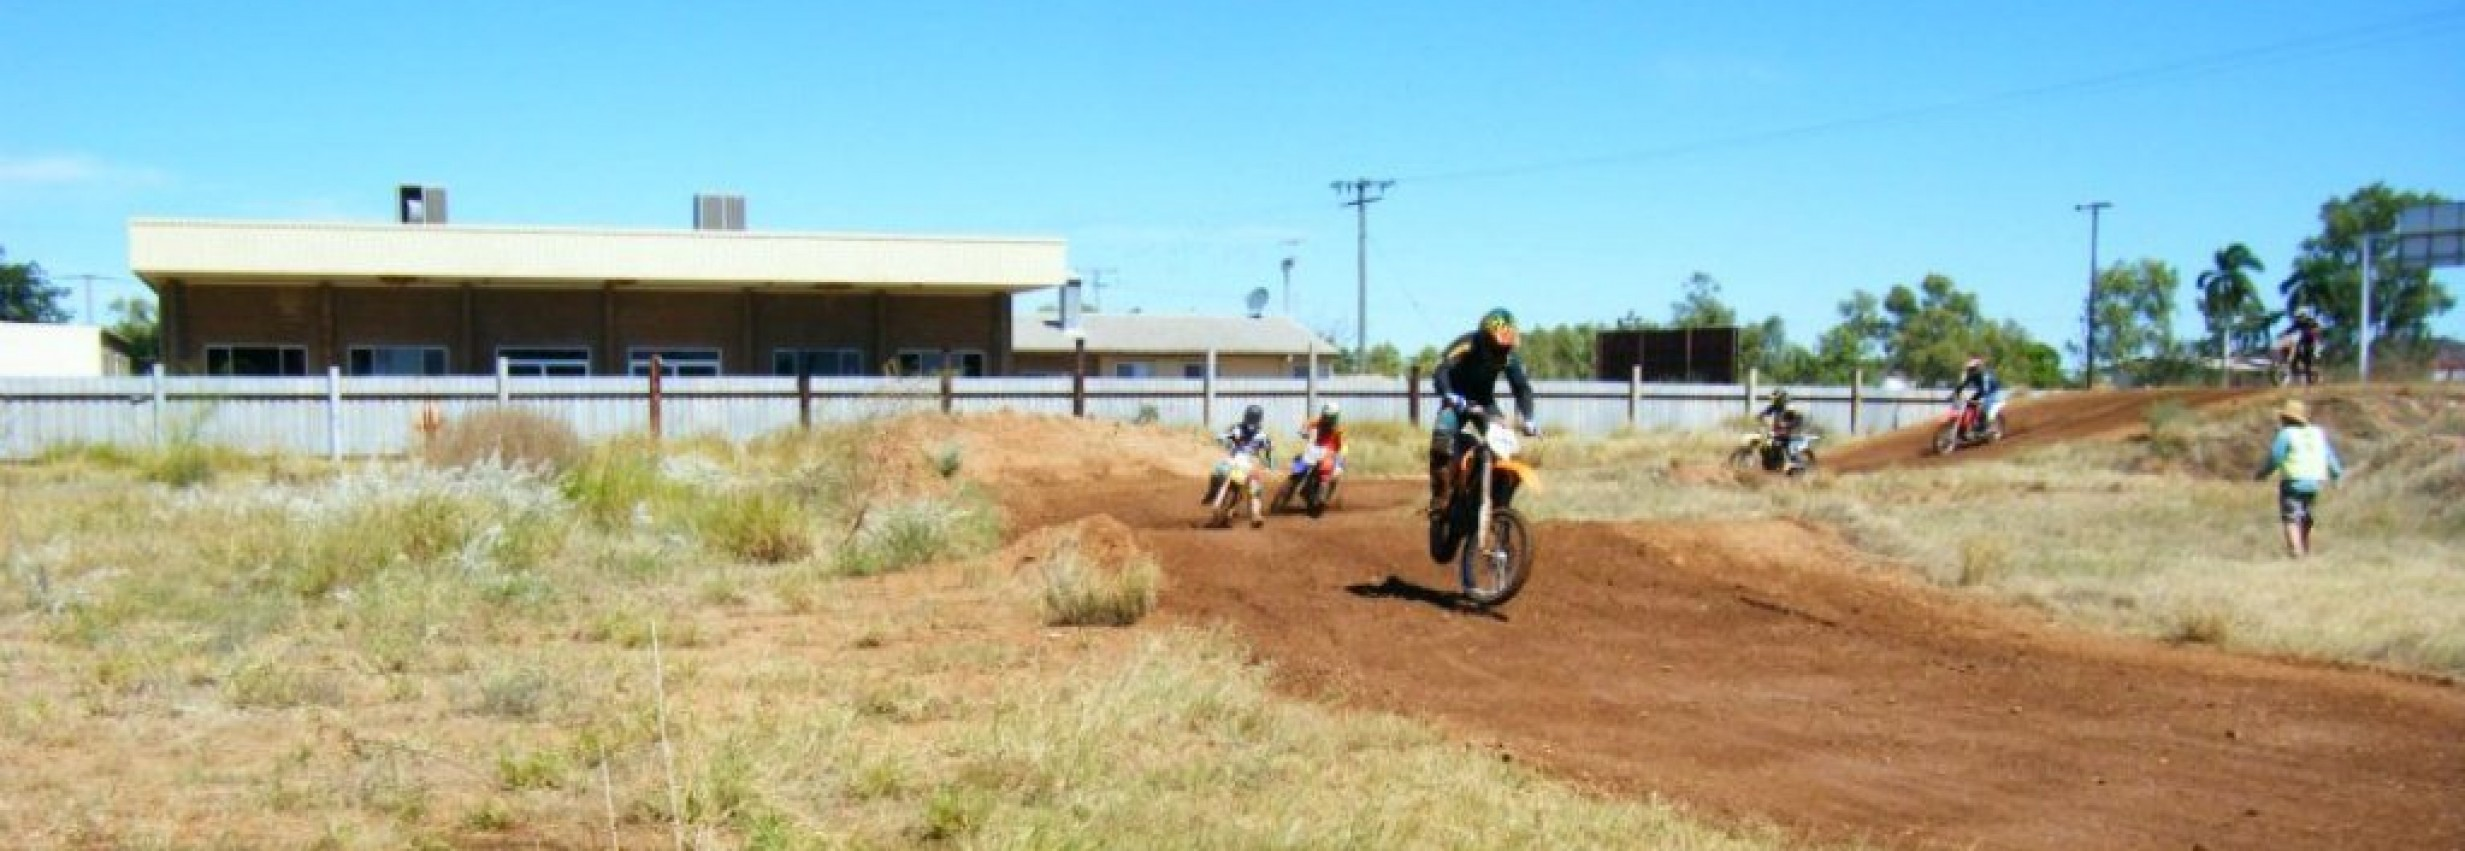 Jubilee Park Motocross Track – Mt Isa Dirt Bike Club